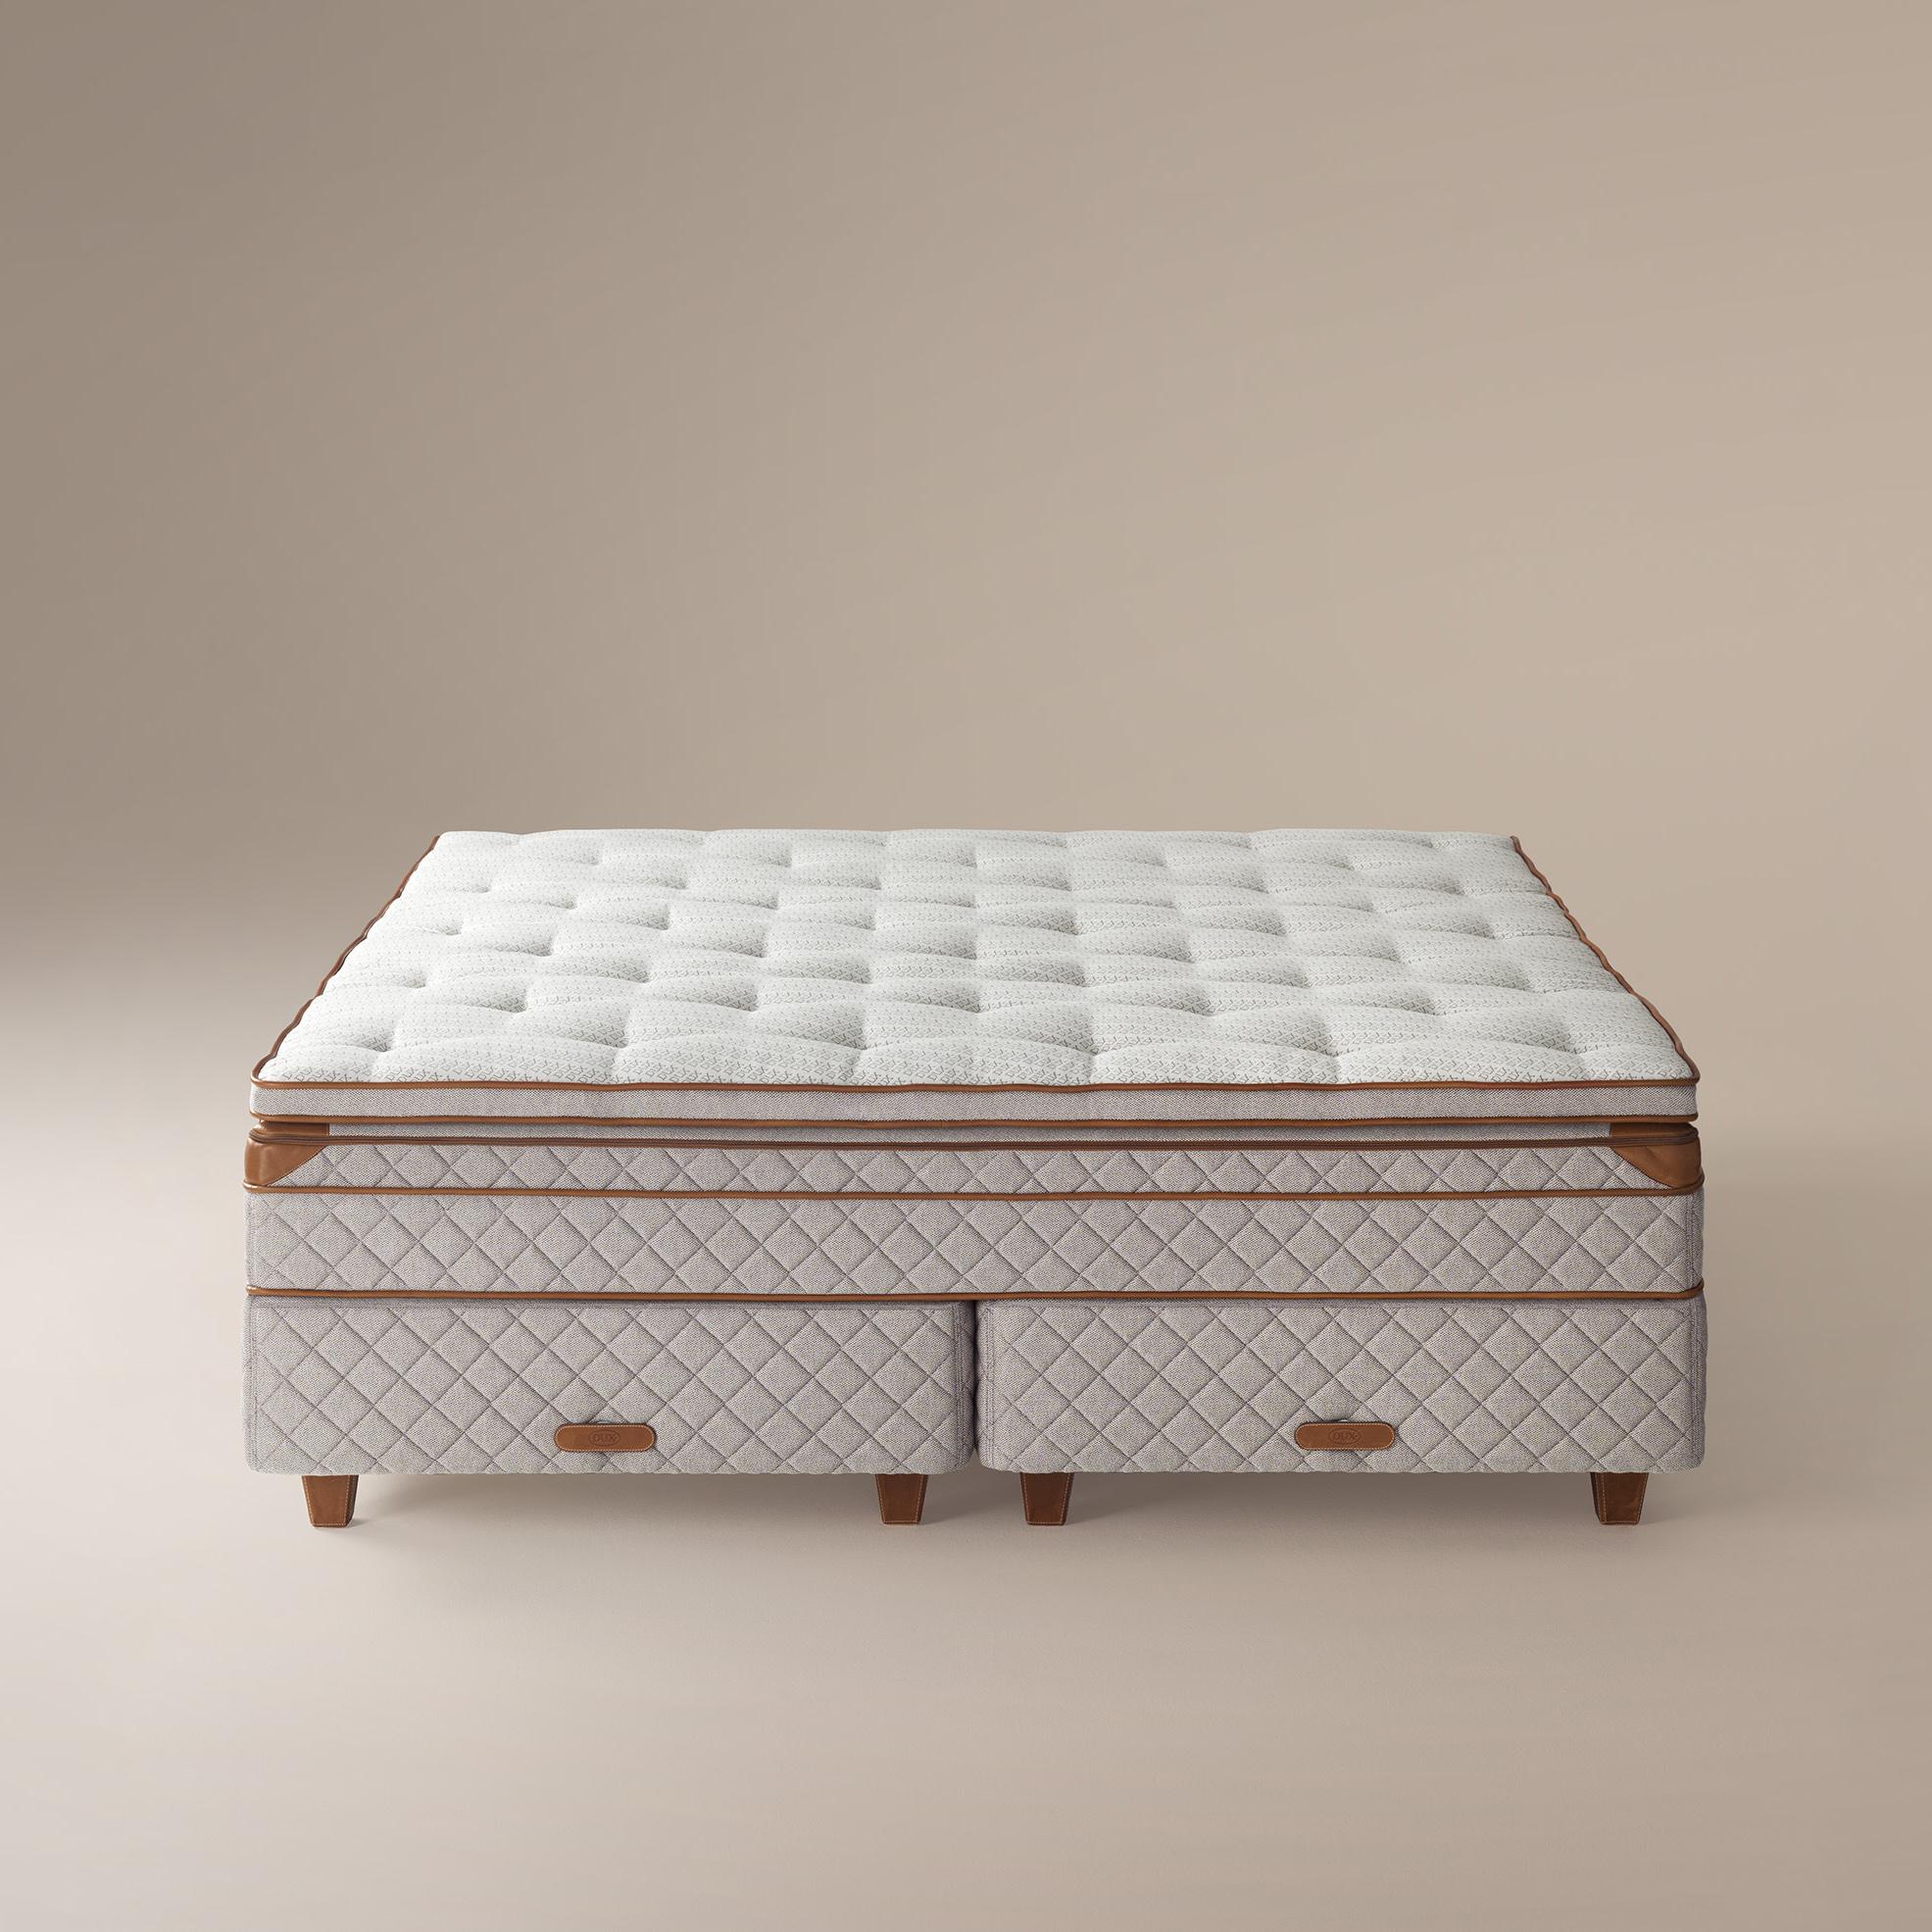 DUX 8008 seng med pascal system.